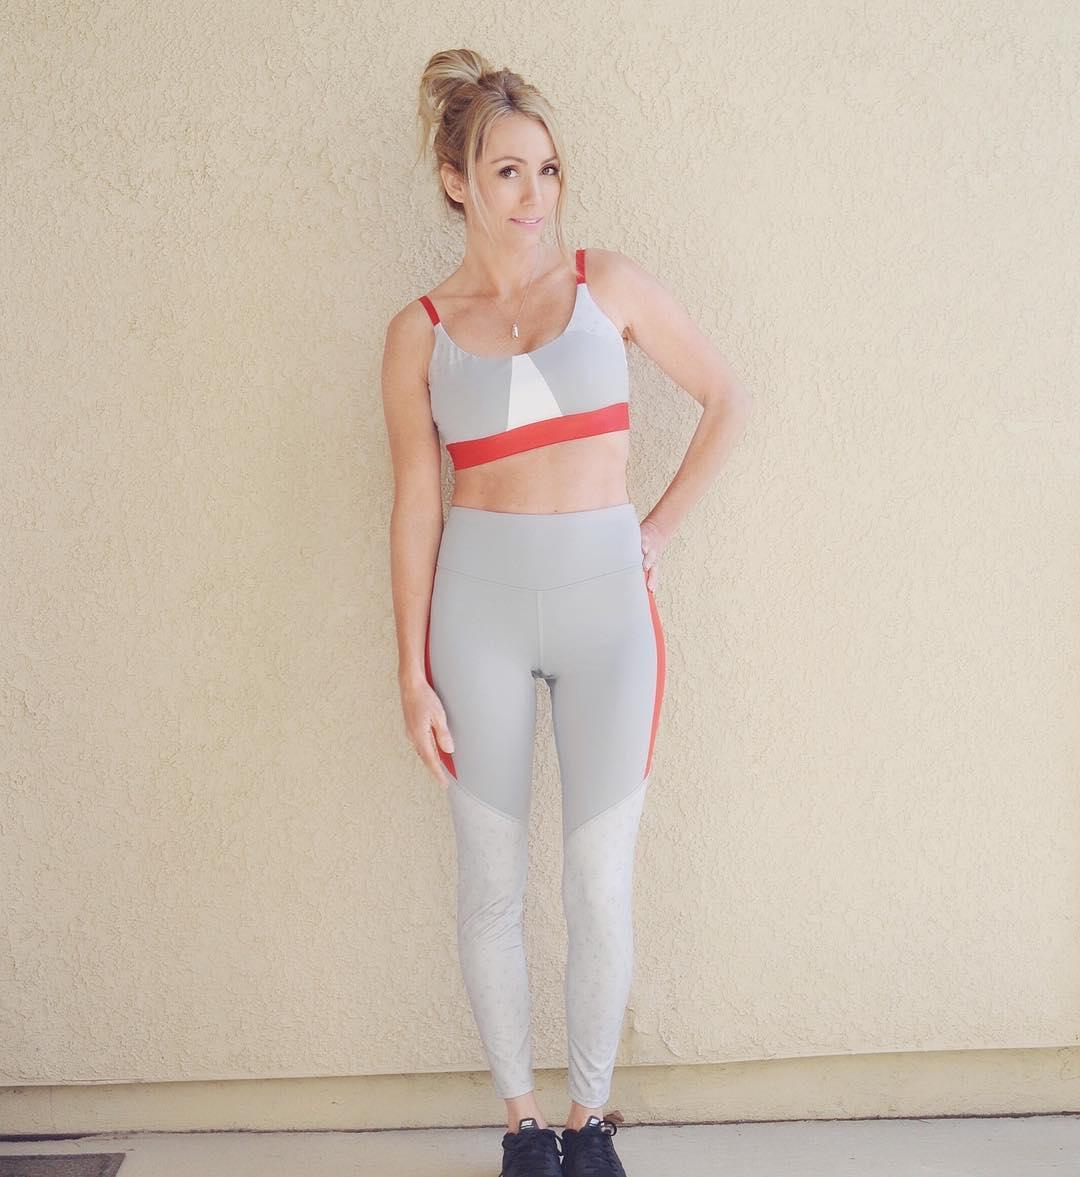 86a581637243e Women s Performance 7 8 Color Block High-Waisted Leggings - JoyLab ...